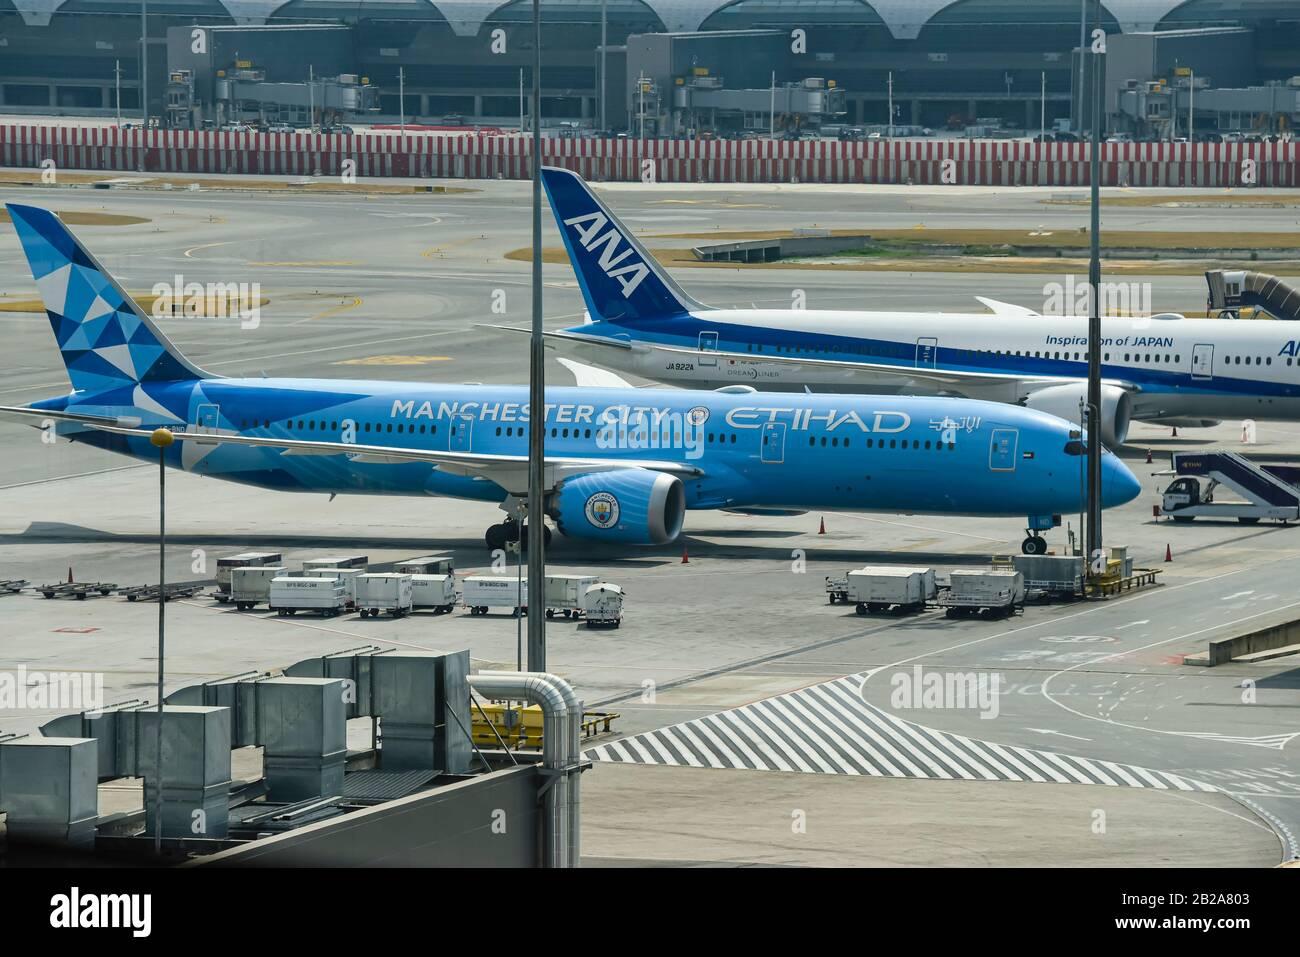 Manchester City themed Etihad Boeing 787-9 Dreamliner A6-BND at Bangkok Airport, Thailand. Stock Photo